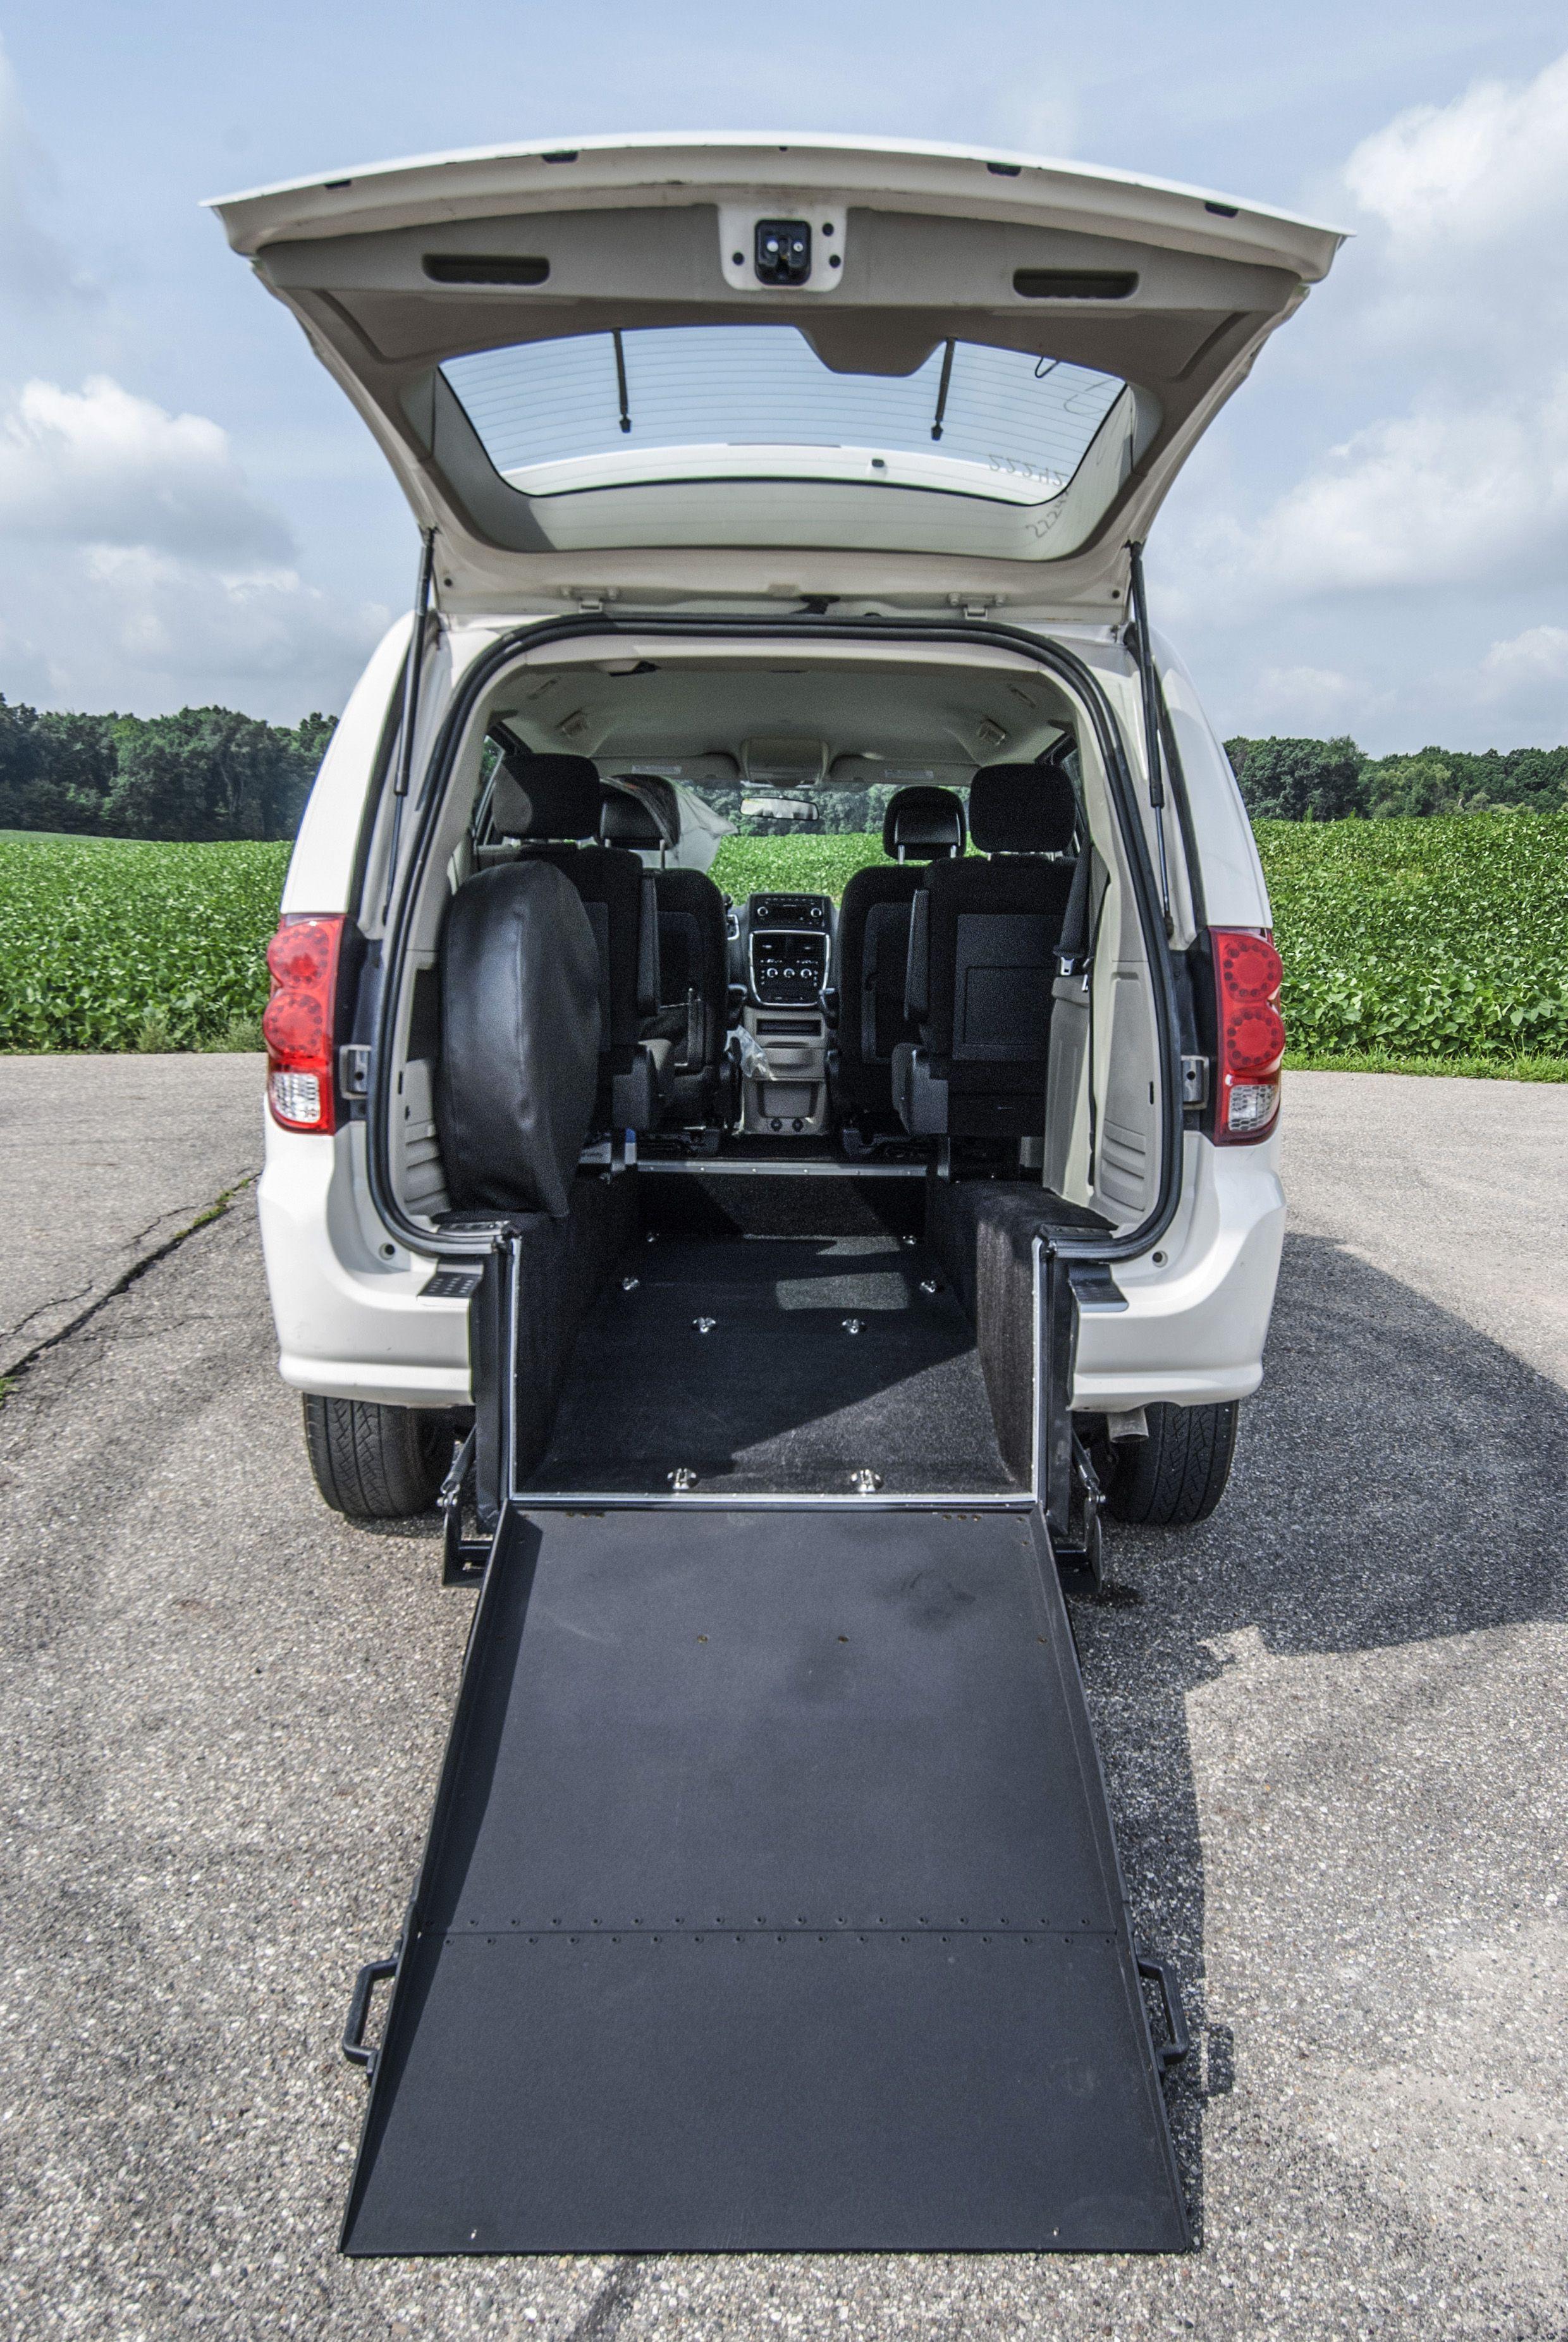 Manual rear entry dodge grand caravan accessibility freedommotorsusa accessible